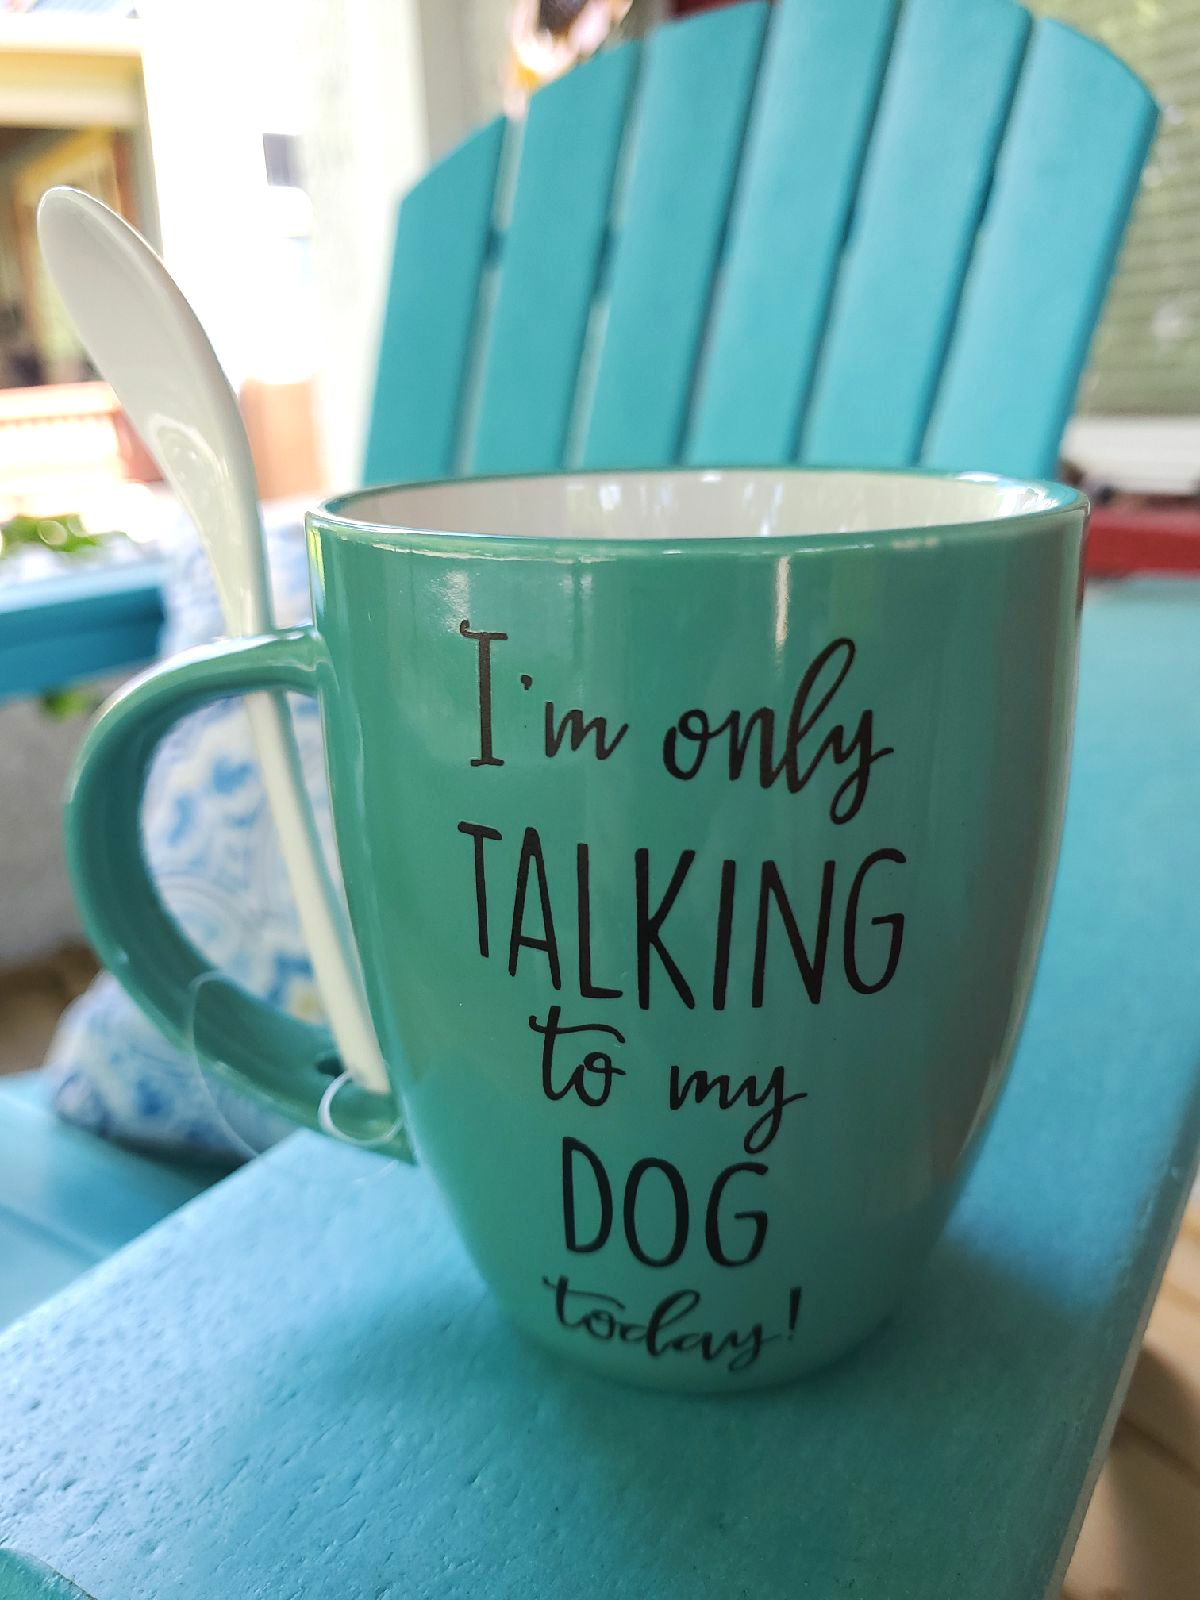 Whimsical turquoise mug with spoon